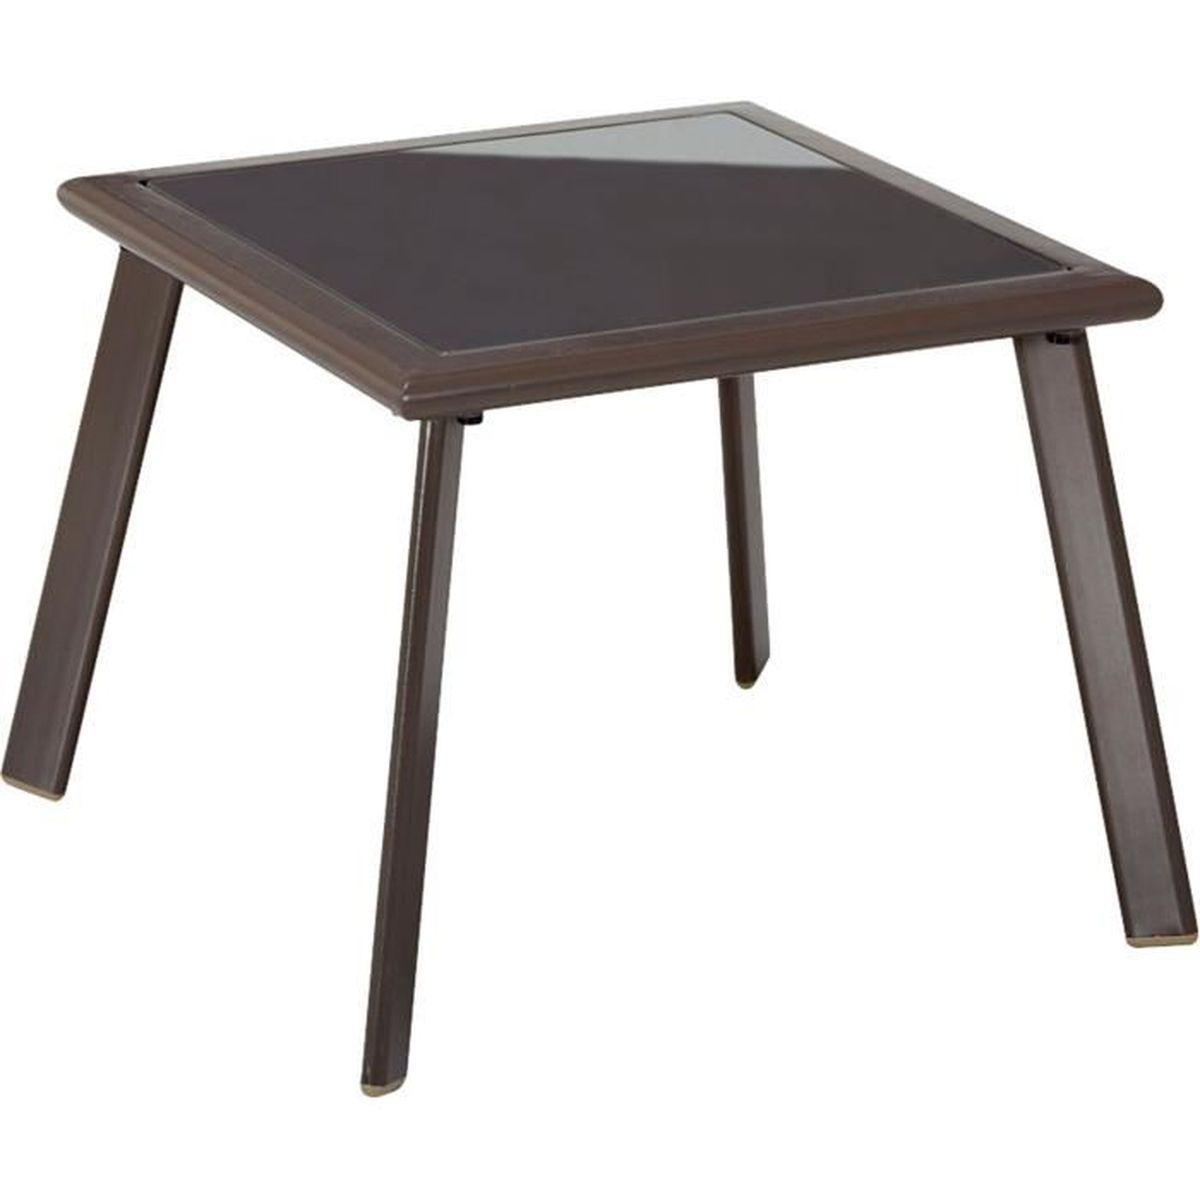 Buny table basse de jardin grise en acier et verre tremp for Table de jardin grise